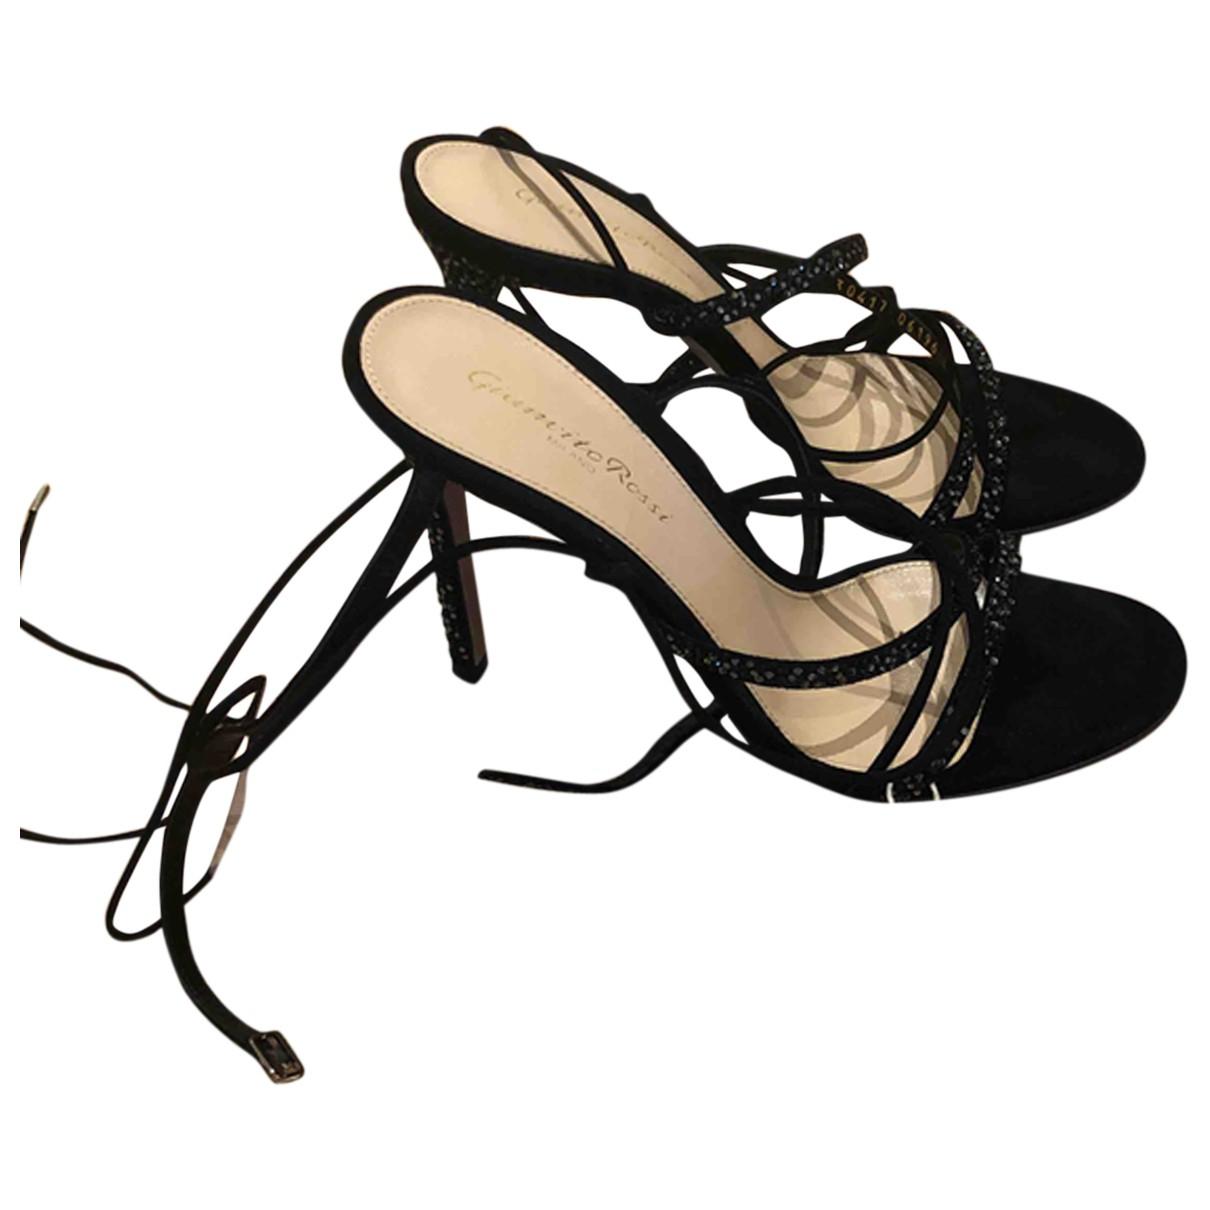 Gianvito Rossi \N Black Suede Sandals for Women 38 EU